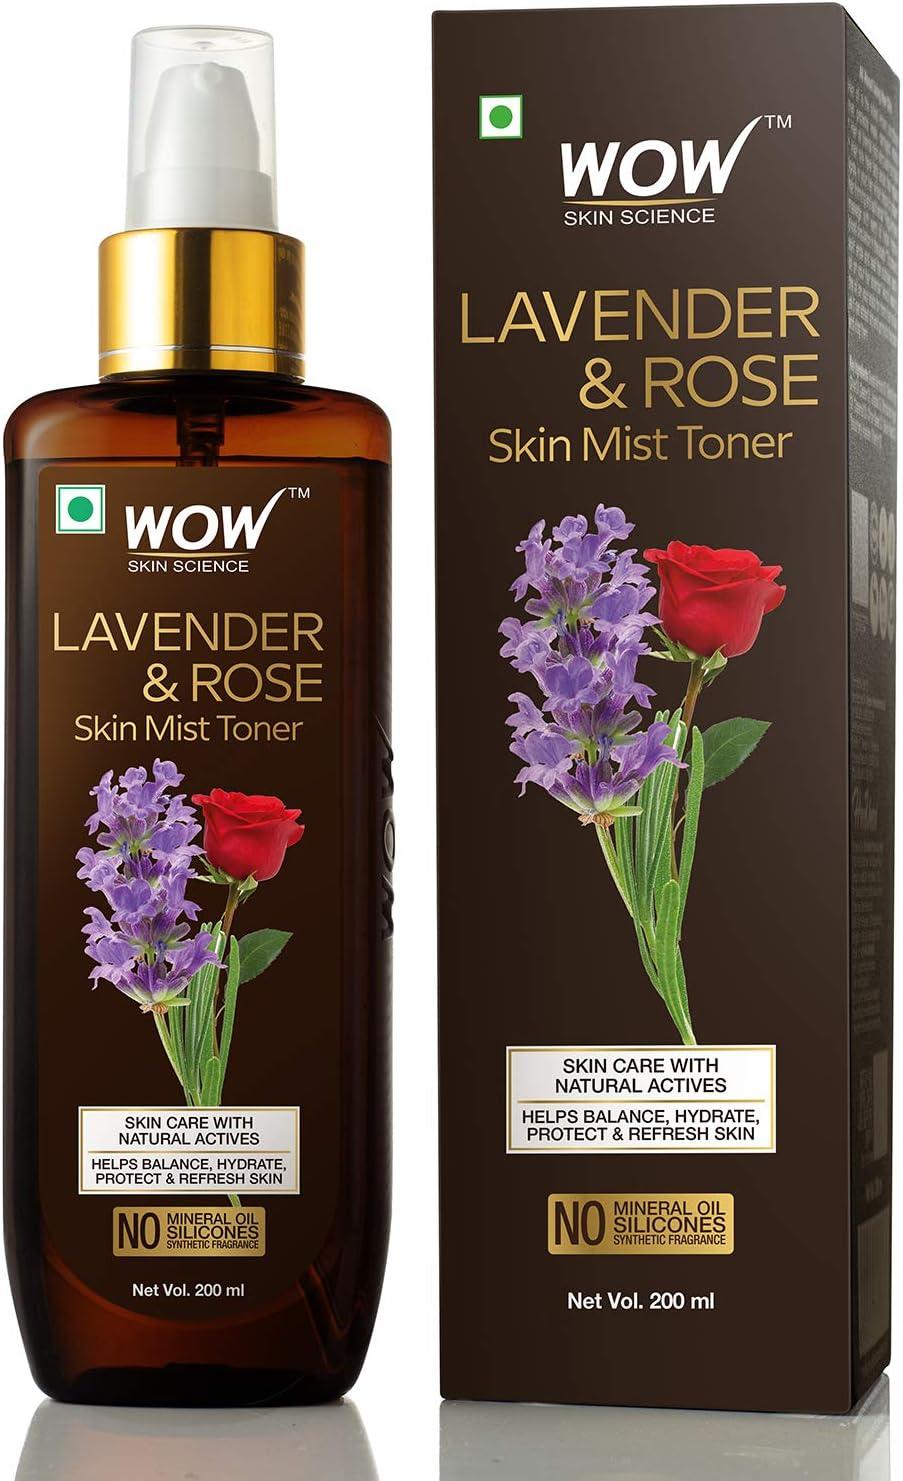 WOW Lavender & Rose Mist Toner